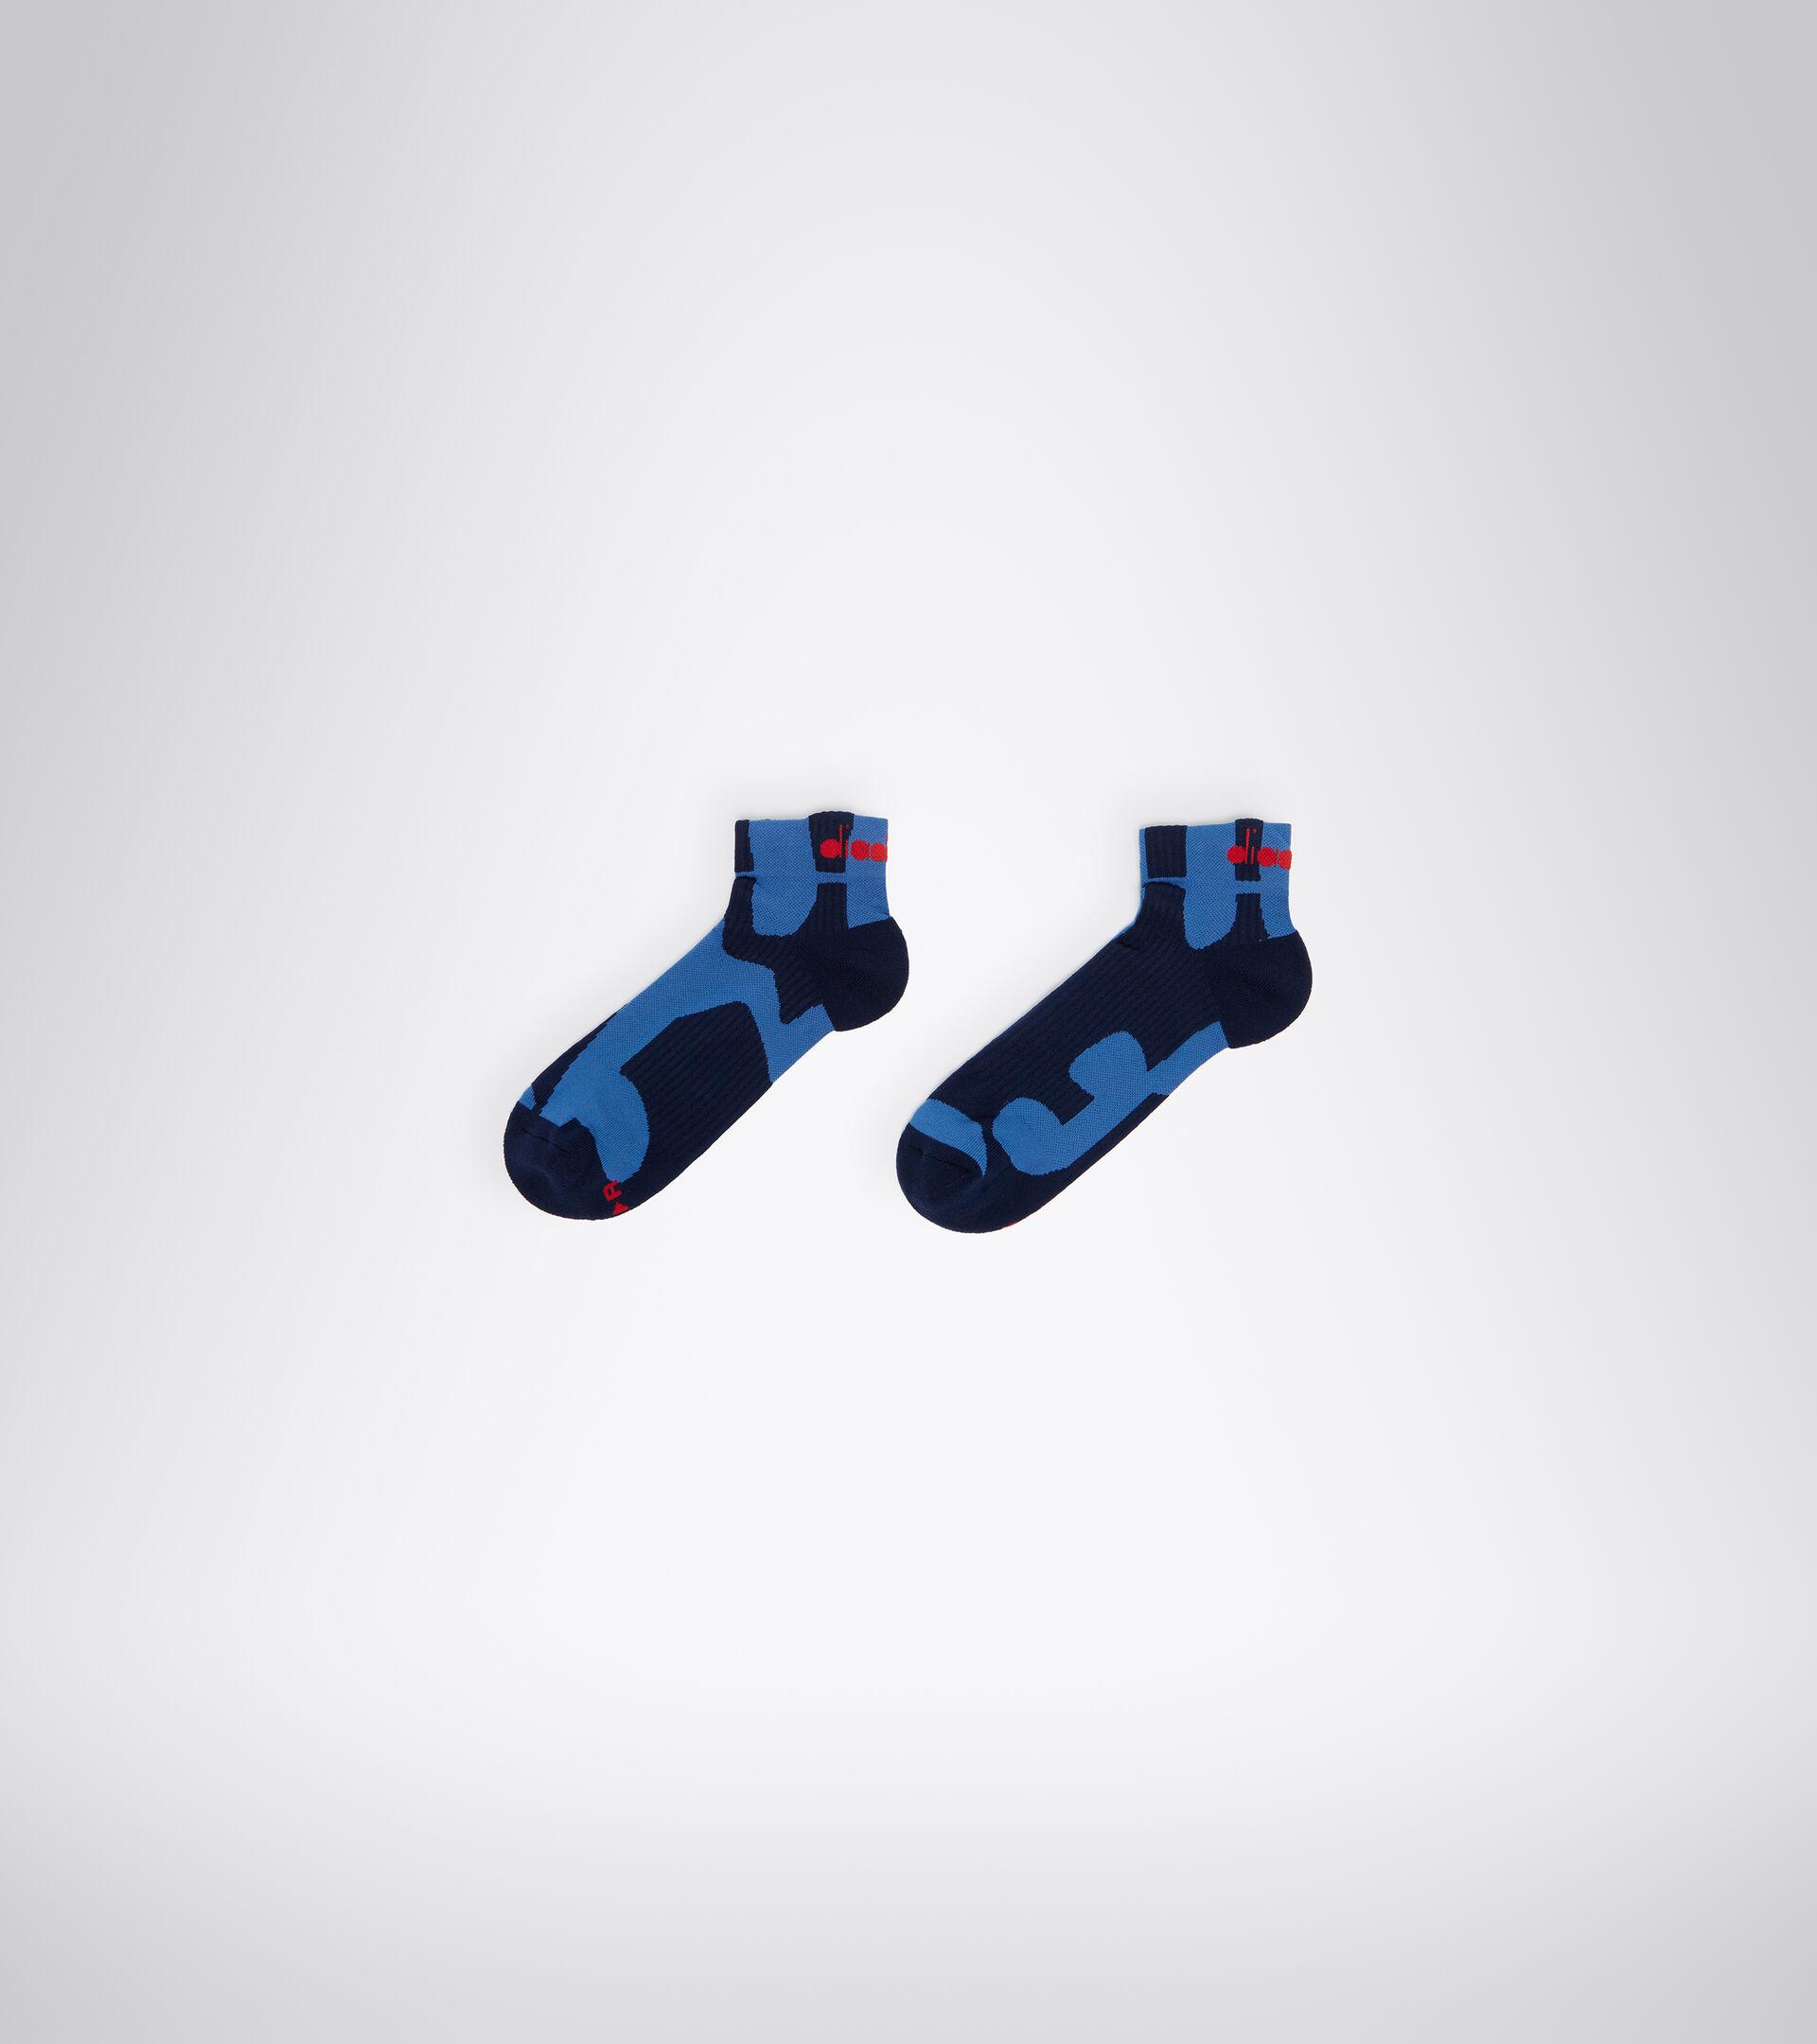 Unisex Running Socks CUSHION QUARTER SOCKS FEDERAL BLUE - Diadora